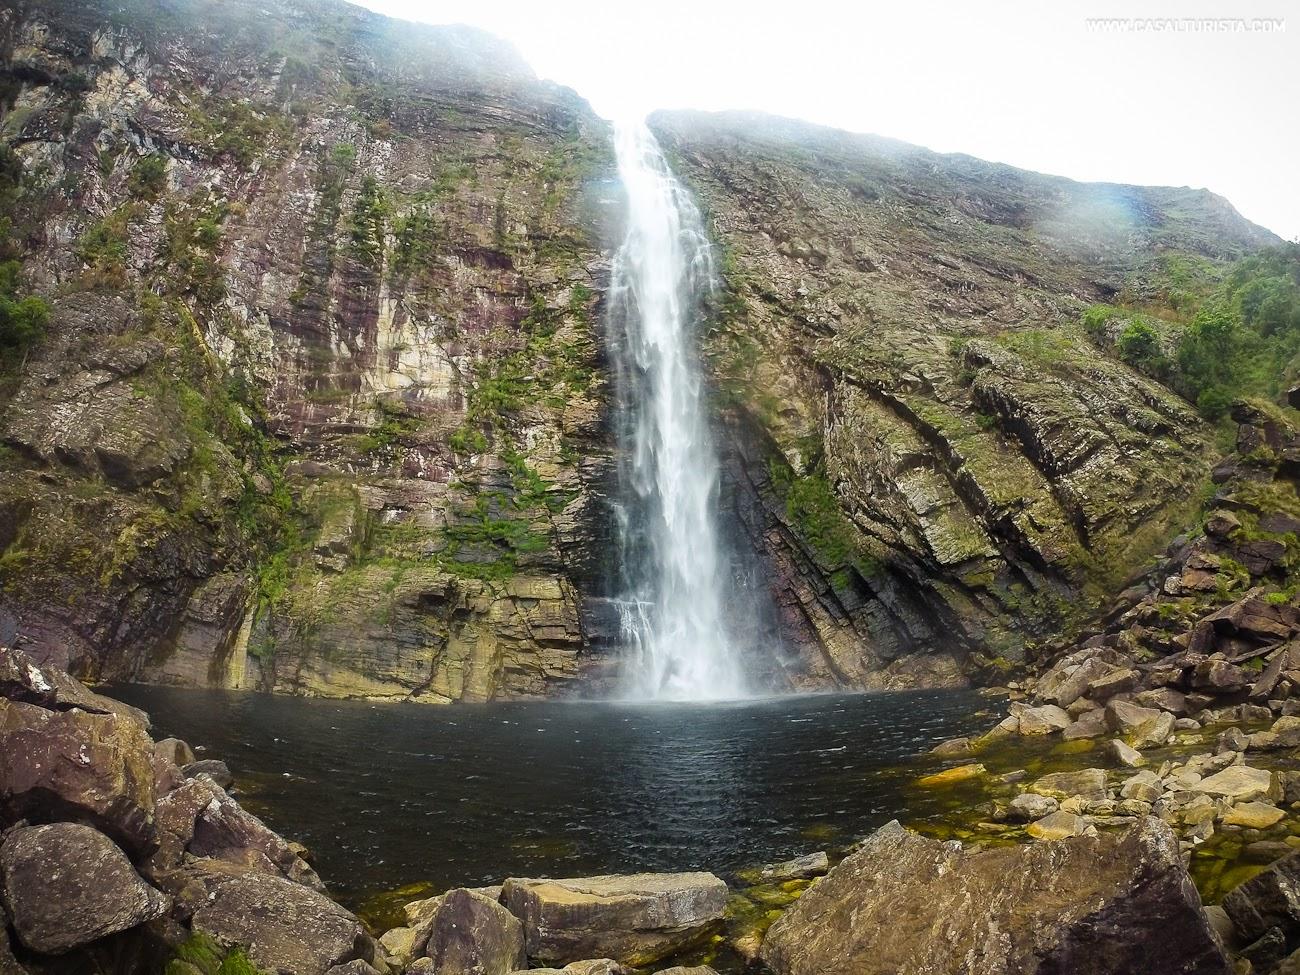 Cachoeira_Casca_DAnta